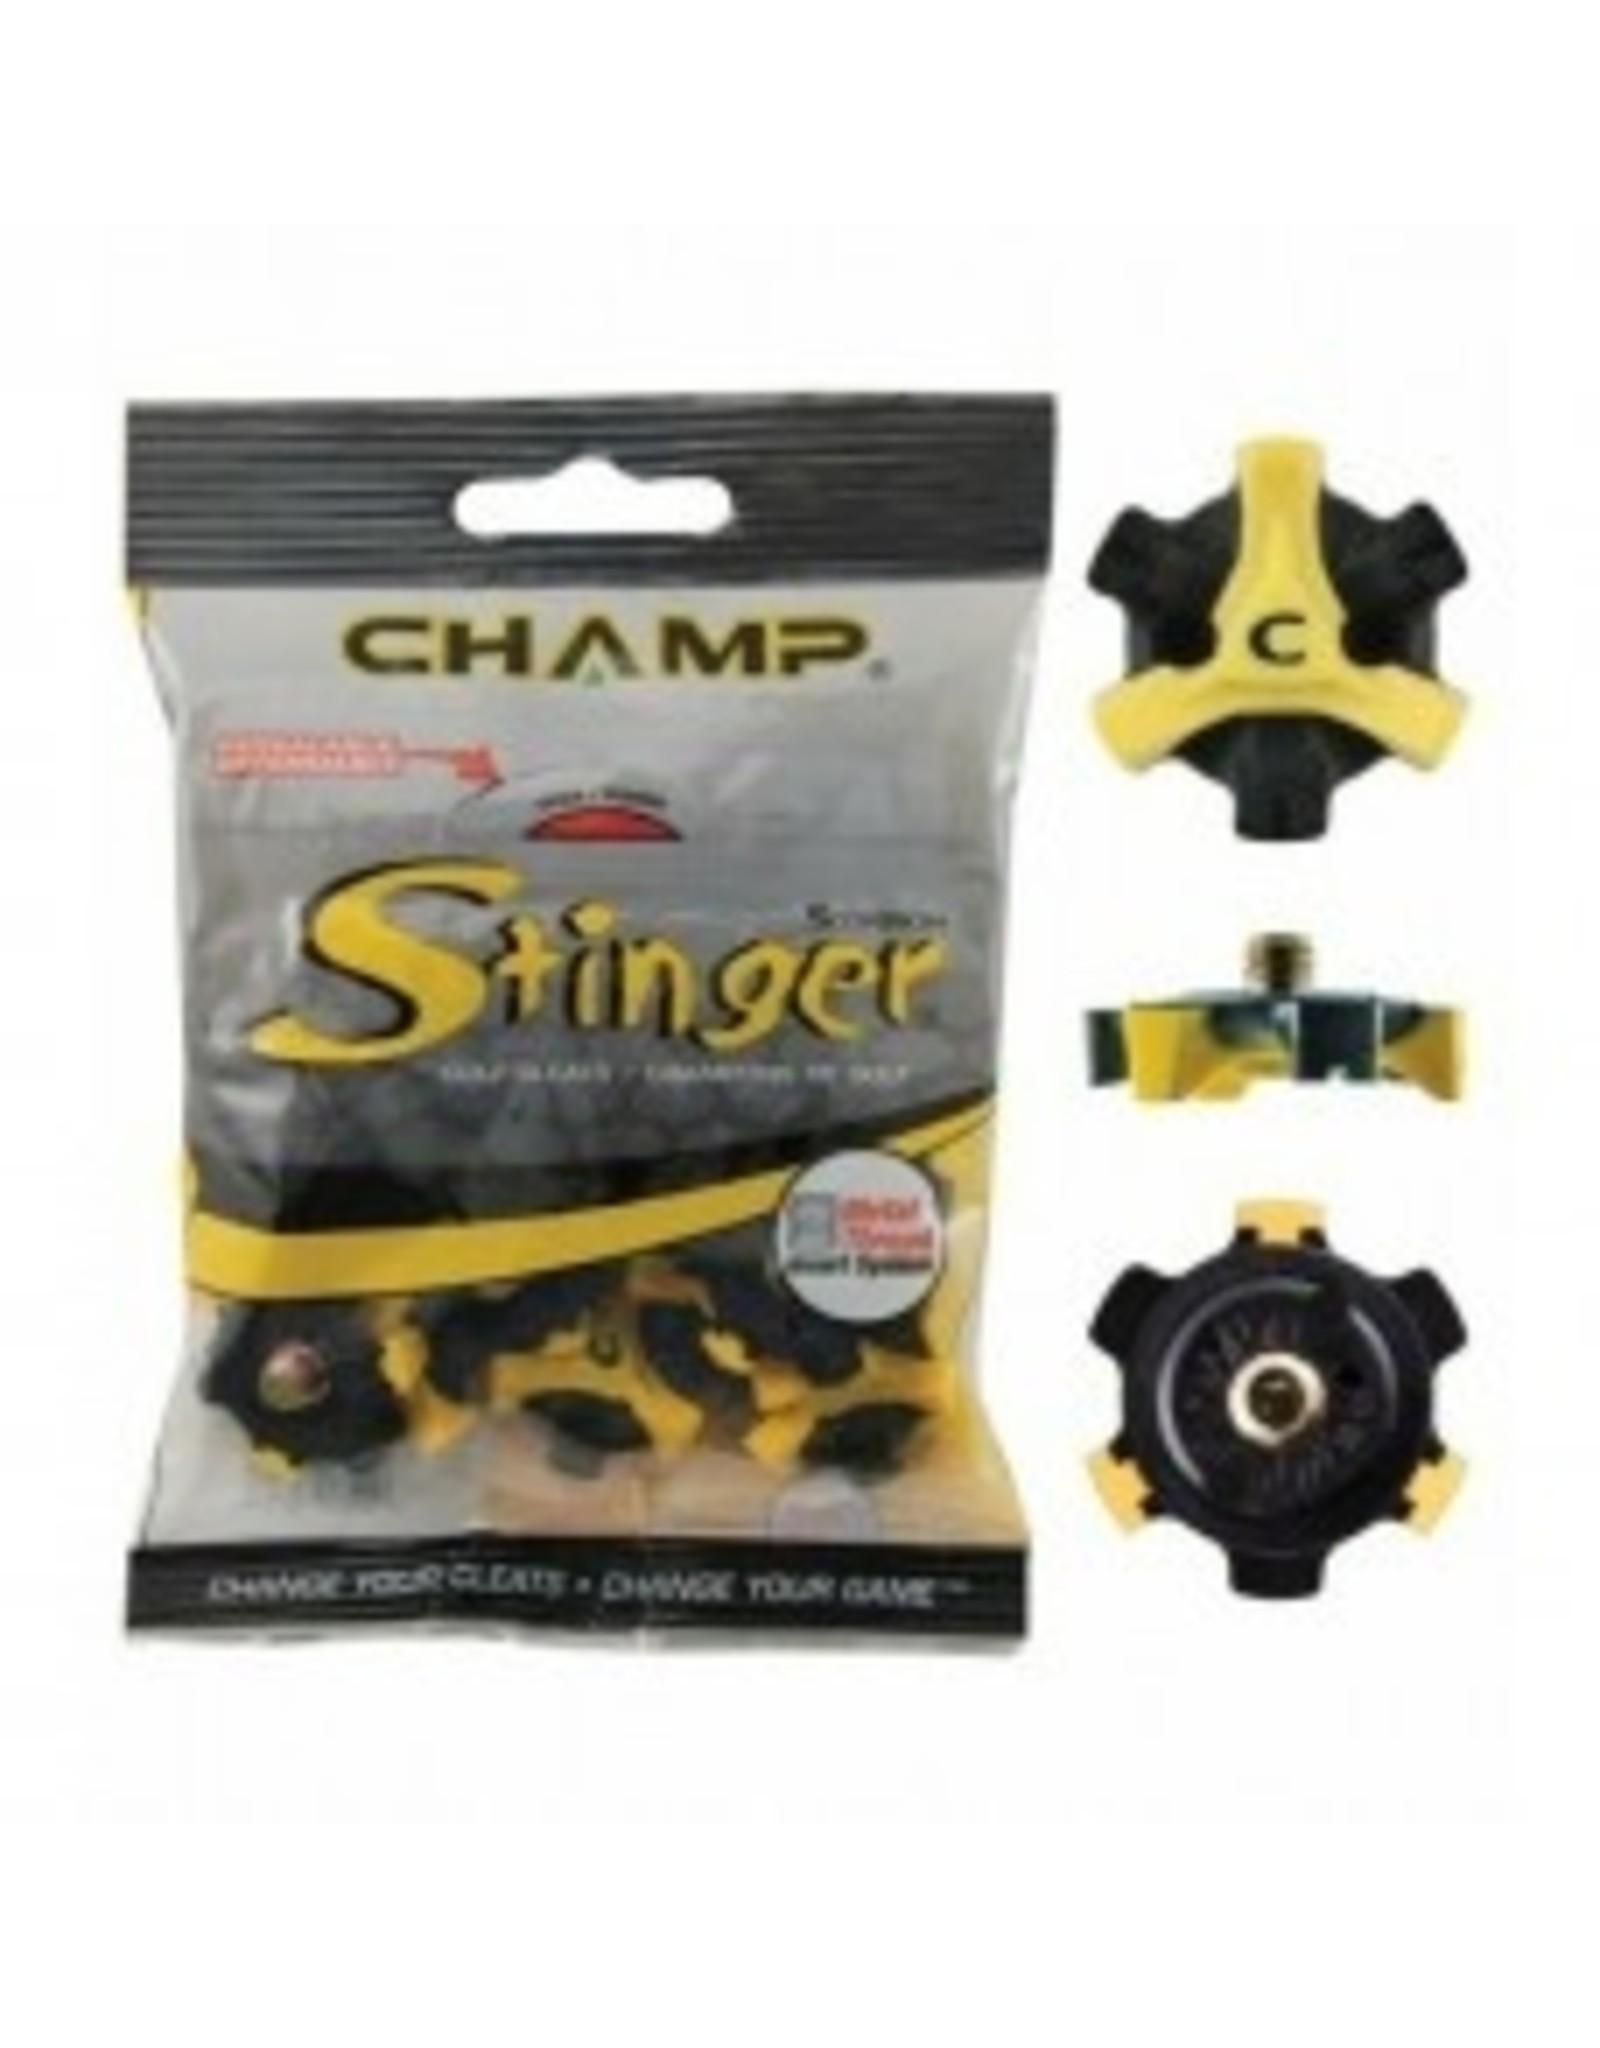 Champ Champs Scorpion Spikes - Metal Thread